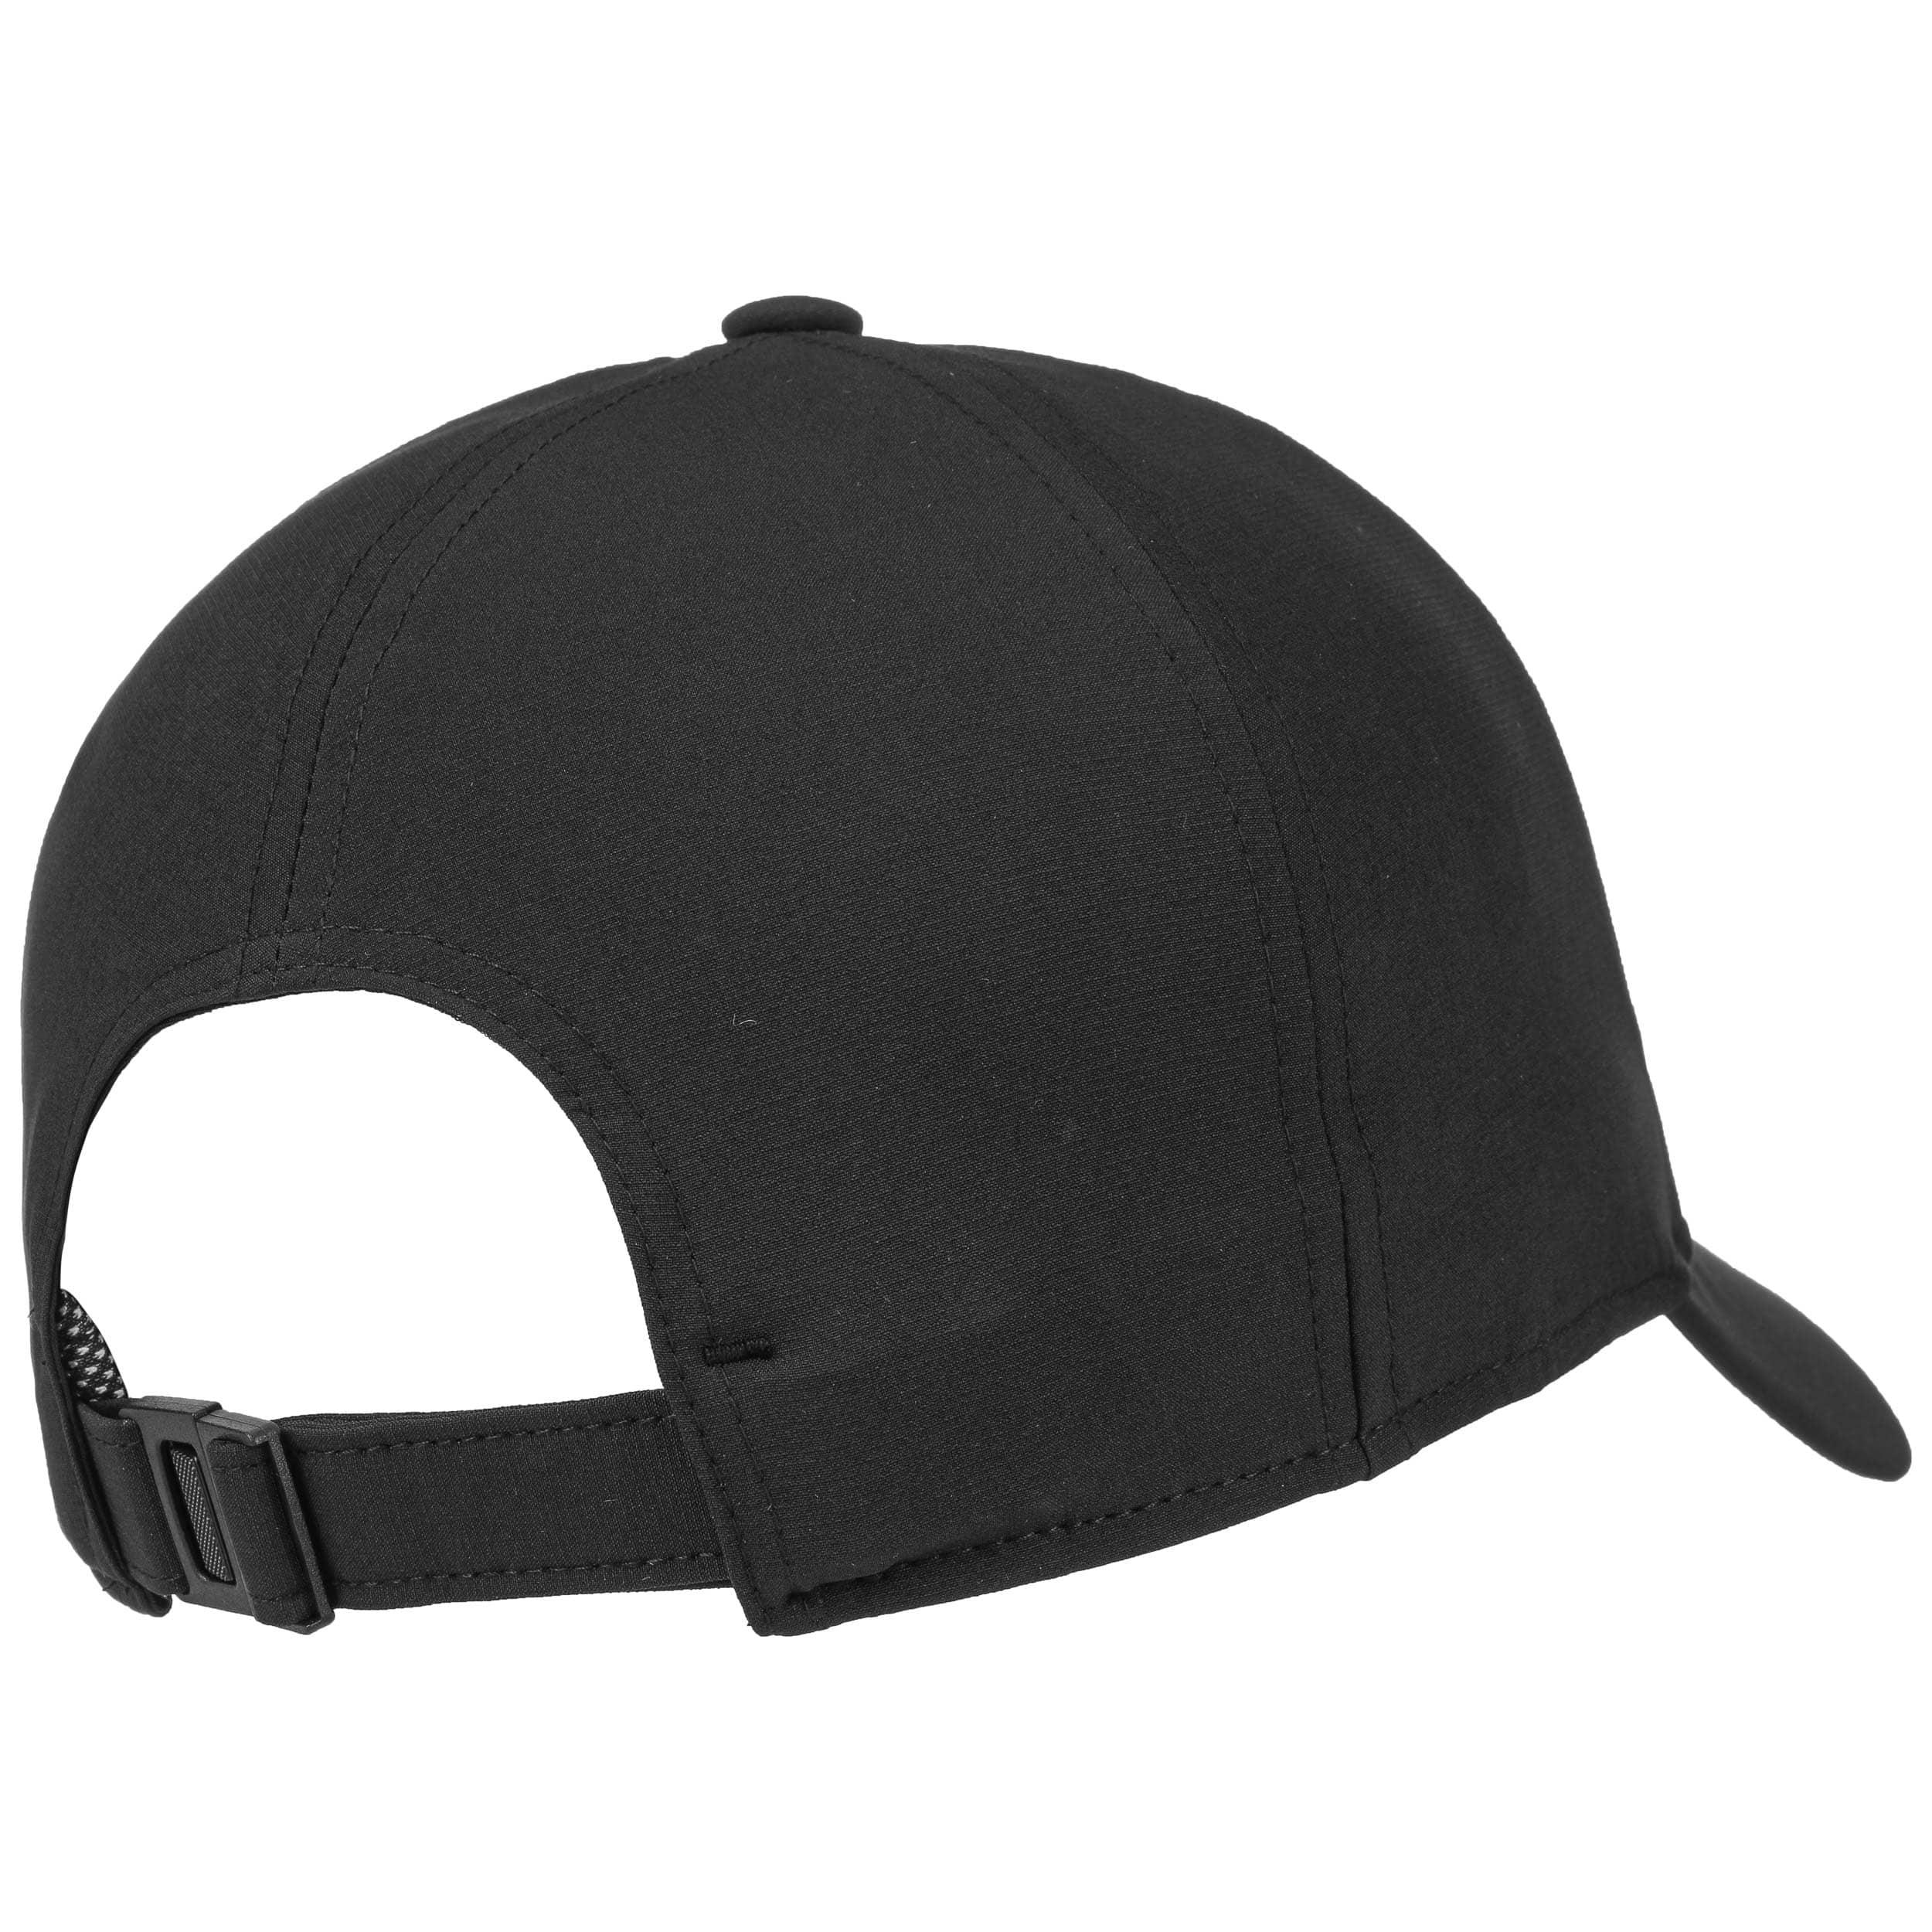 95bba466f ... C40 6P 3S Climalite Cap by adidas - black 3 ...